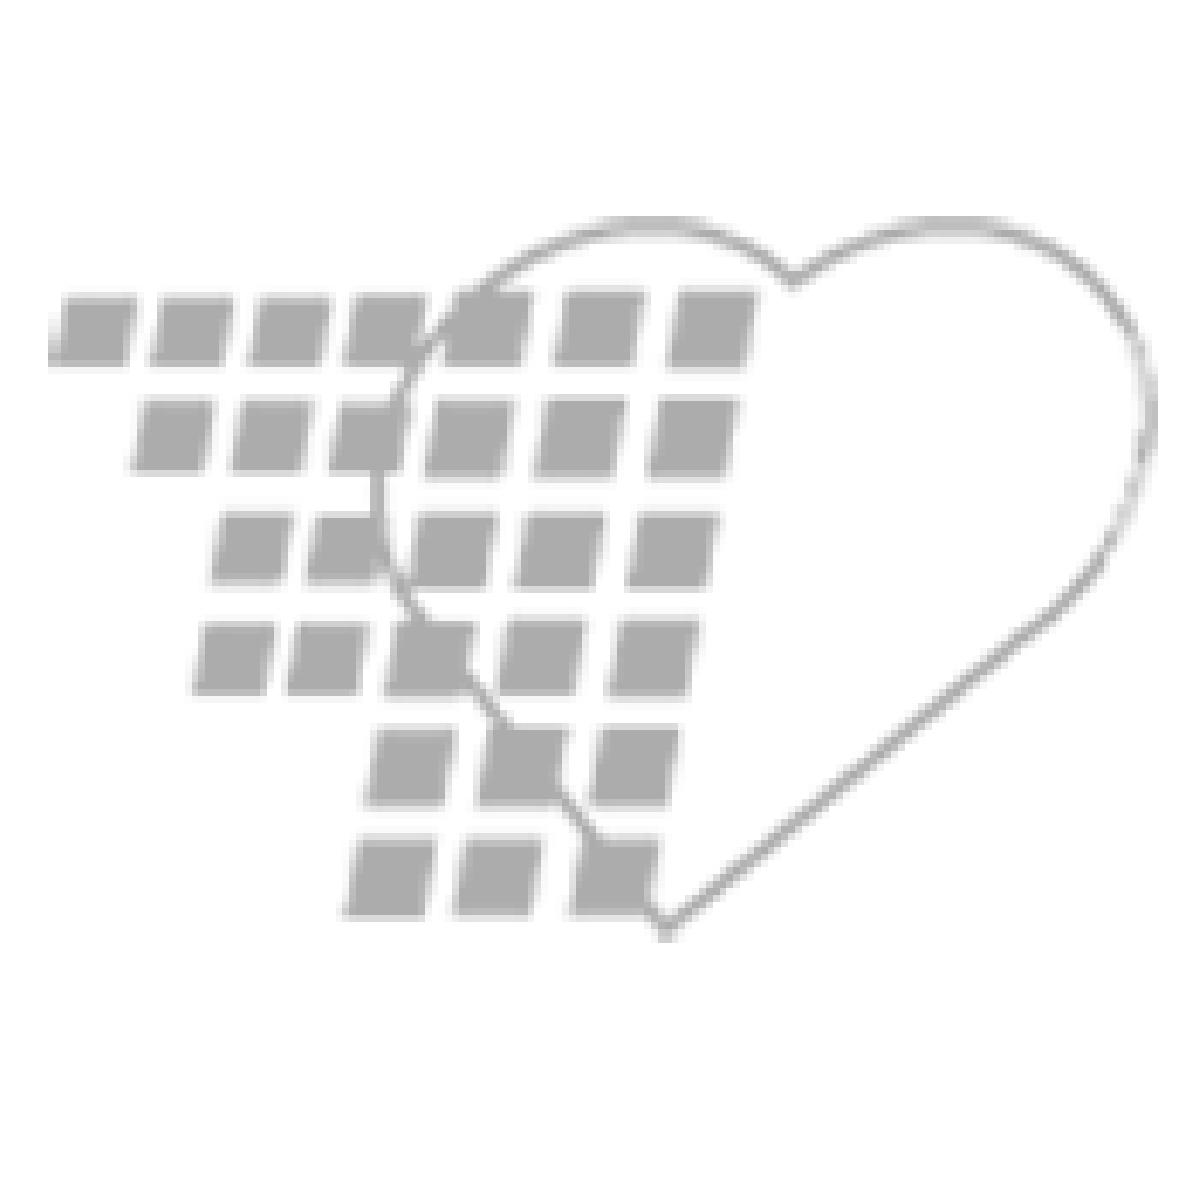 Fedex_map_info